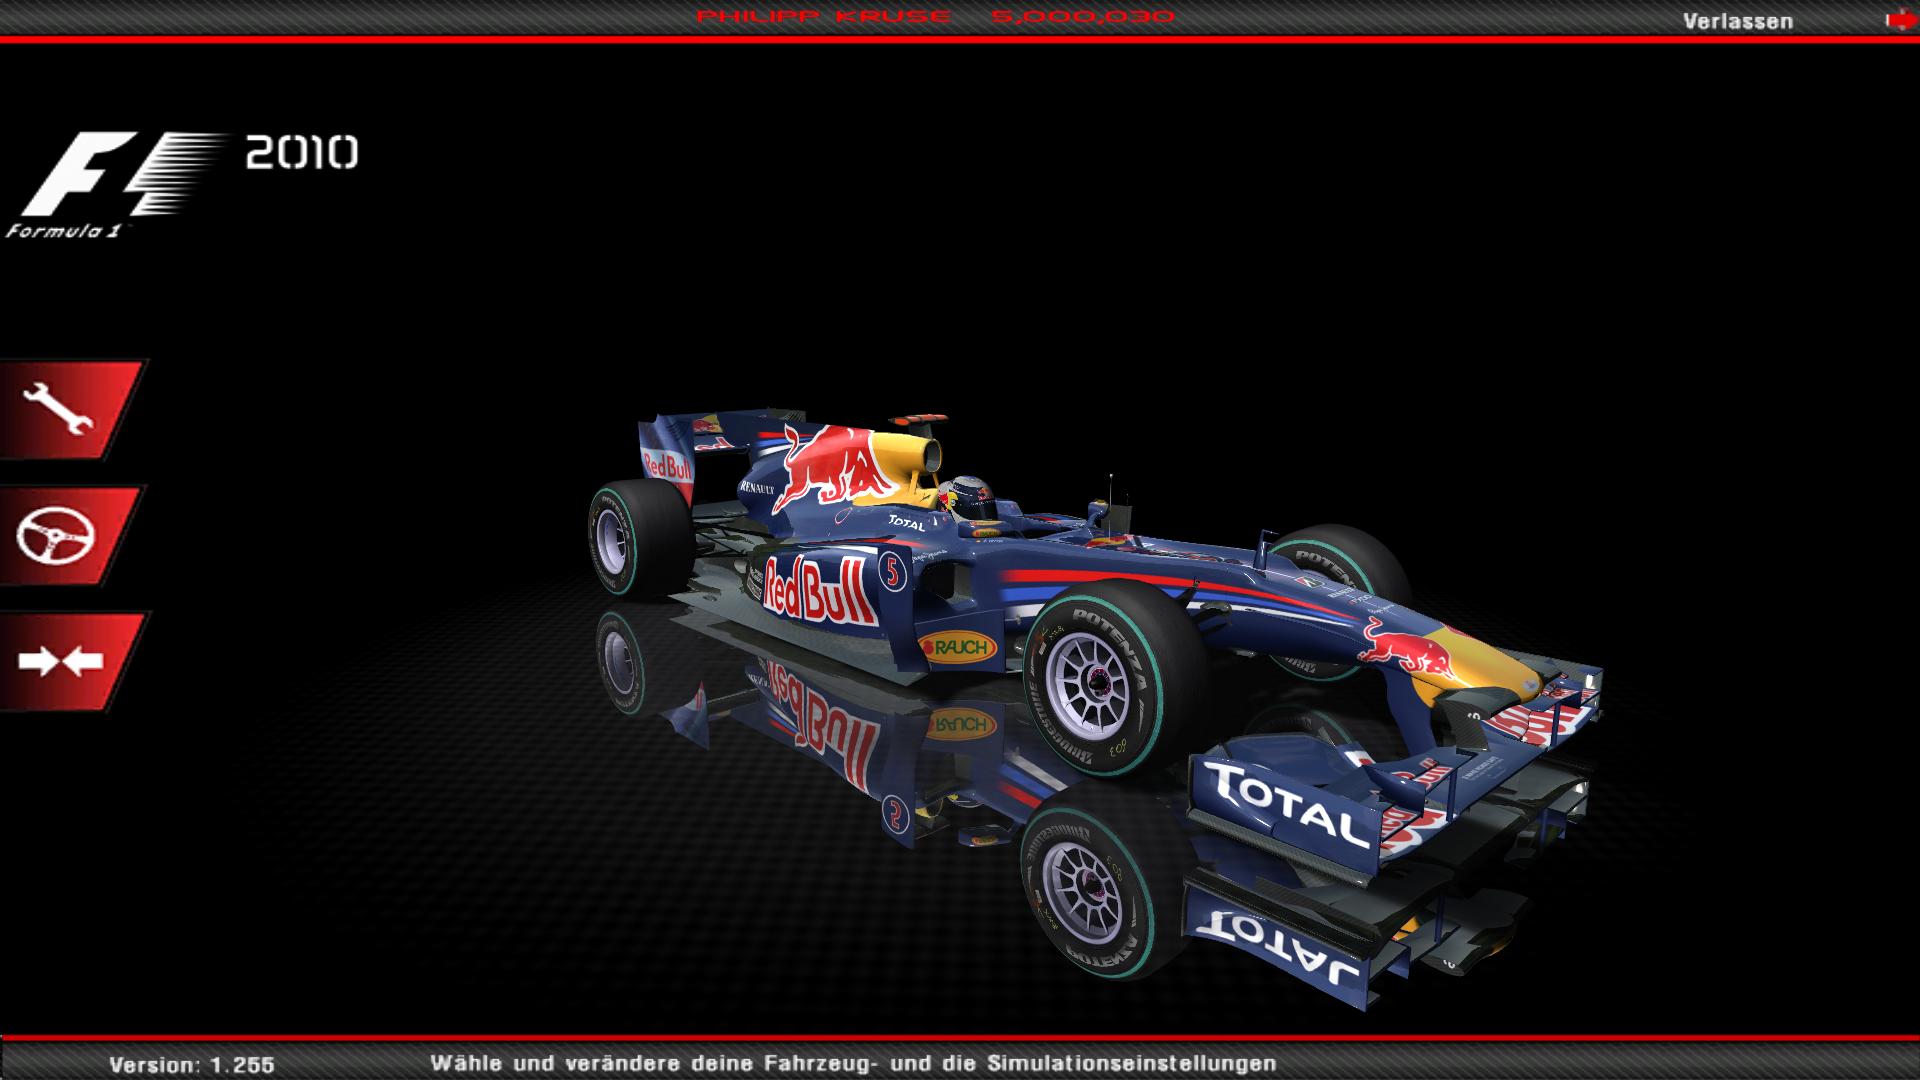 F1 2010 LE - Mod a utilizar en el server. 03_rbr_shader3dkf